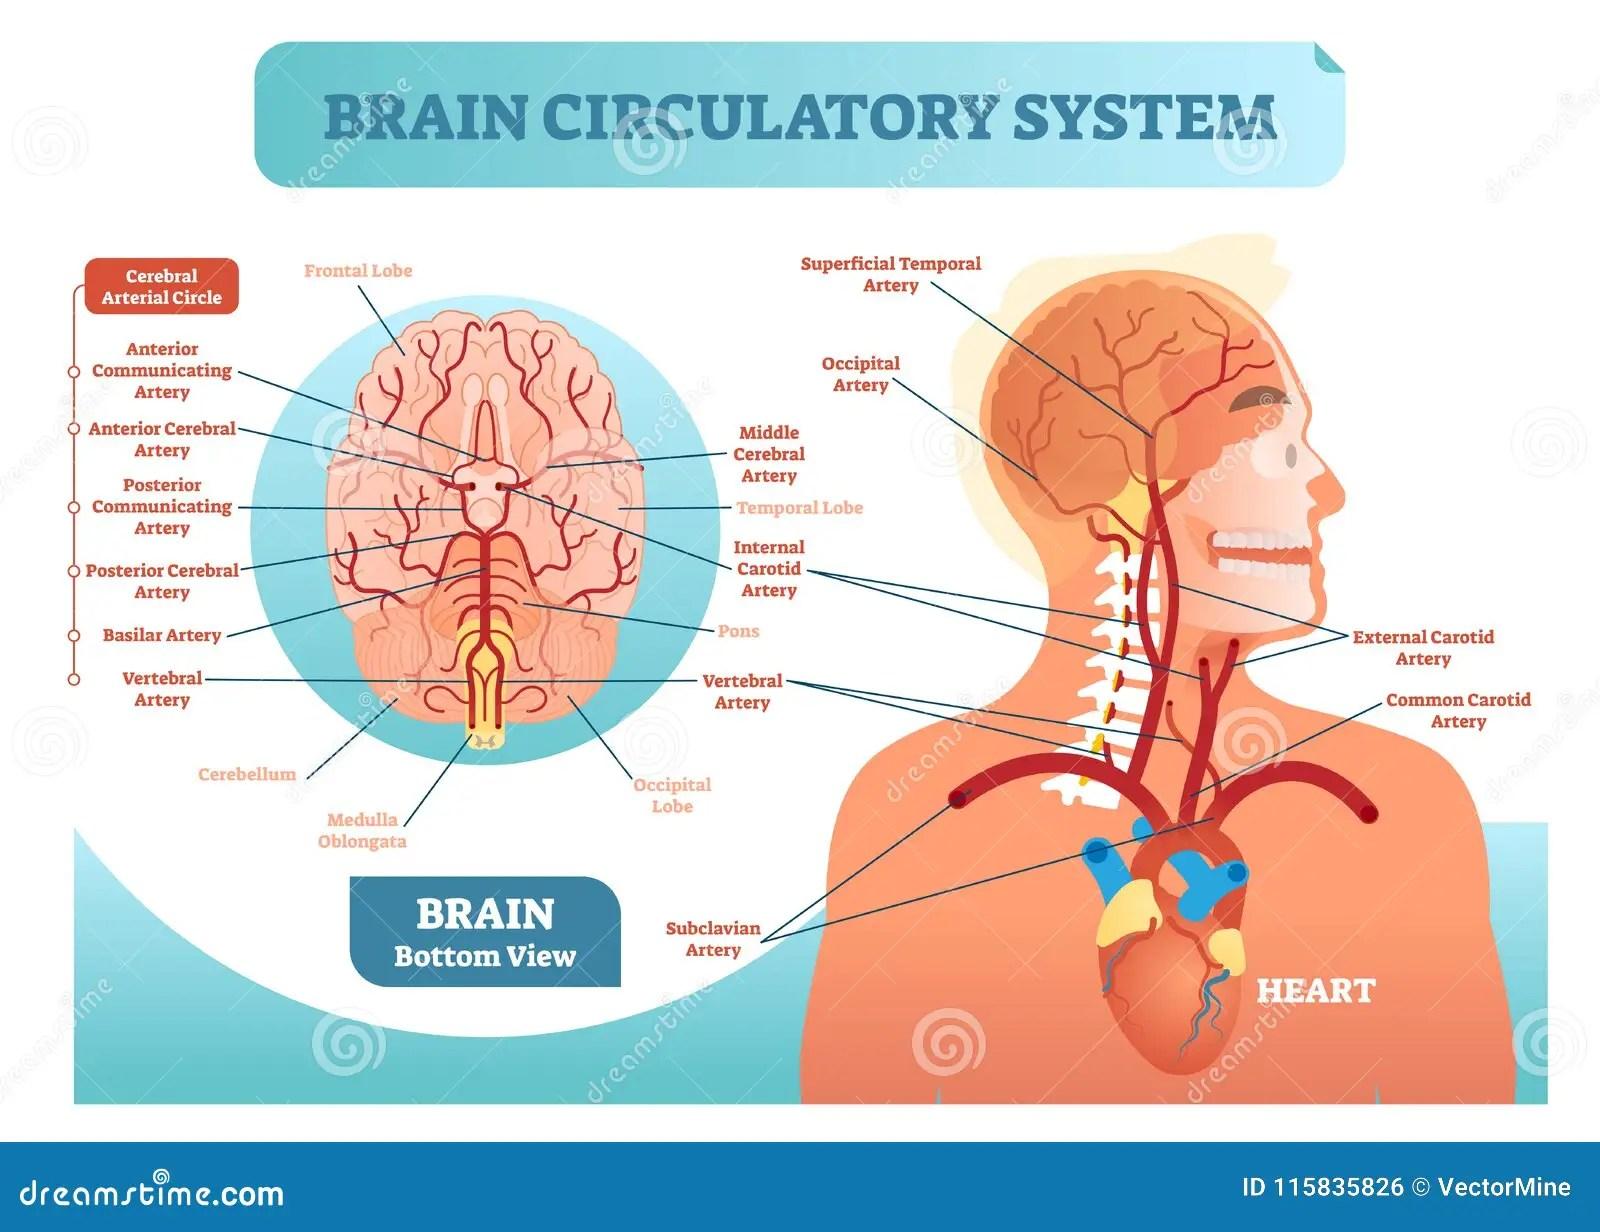 internal brain diagram honda ruckus ignition wiring circulatory system anatomical vector illustration human blood vessel network scheme